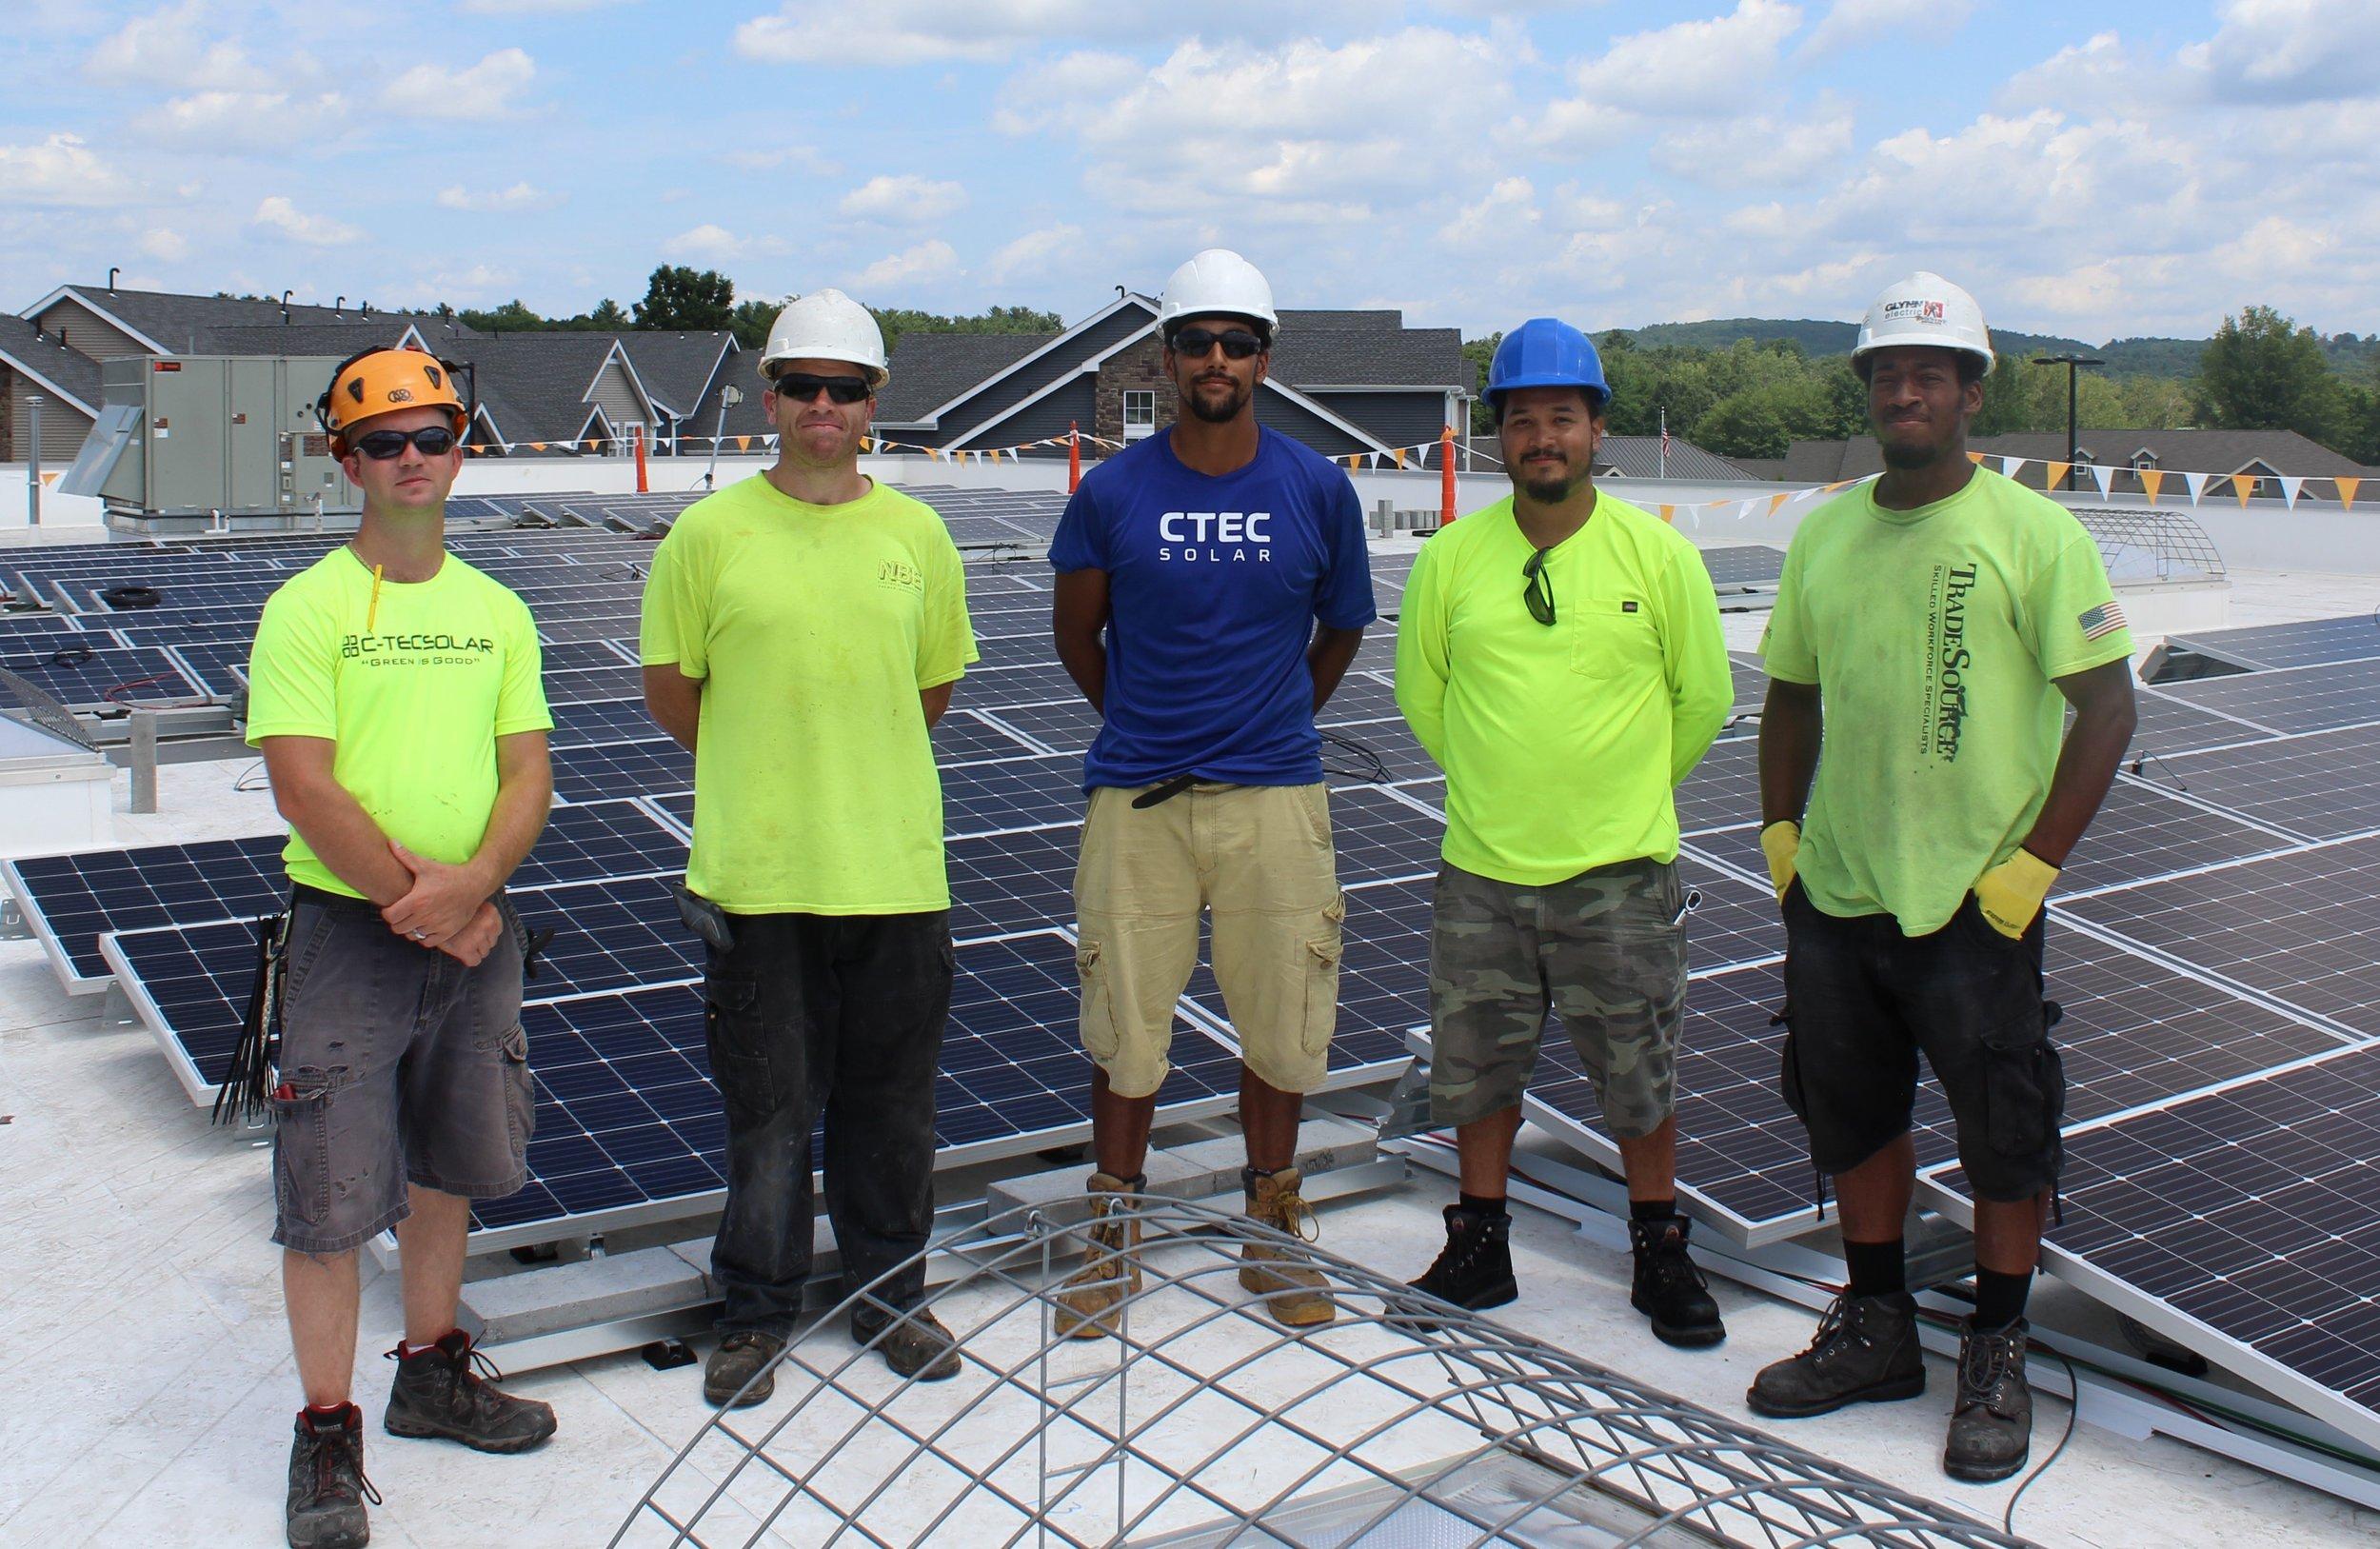 The CTEC Solar crew at the Sunwealth Whole Foods Market Sudbury solar site.